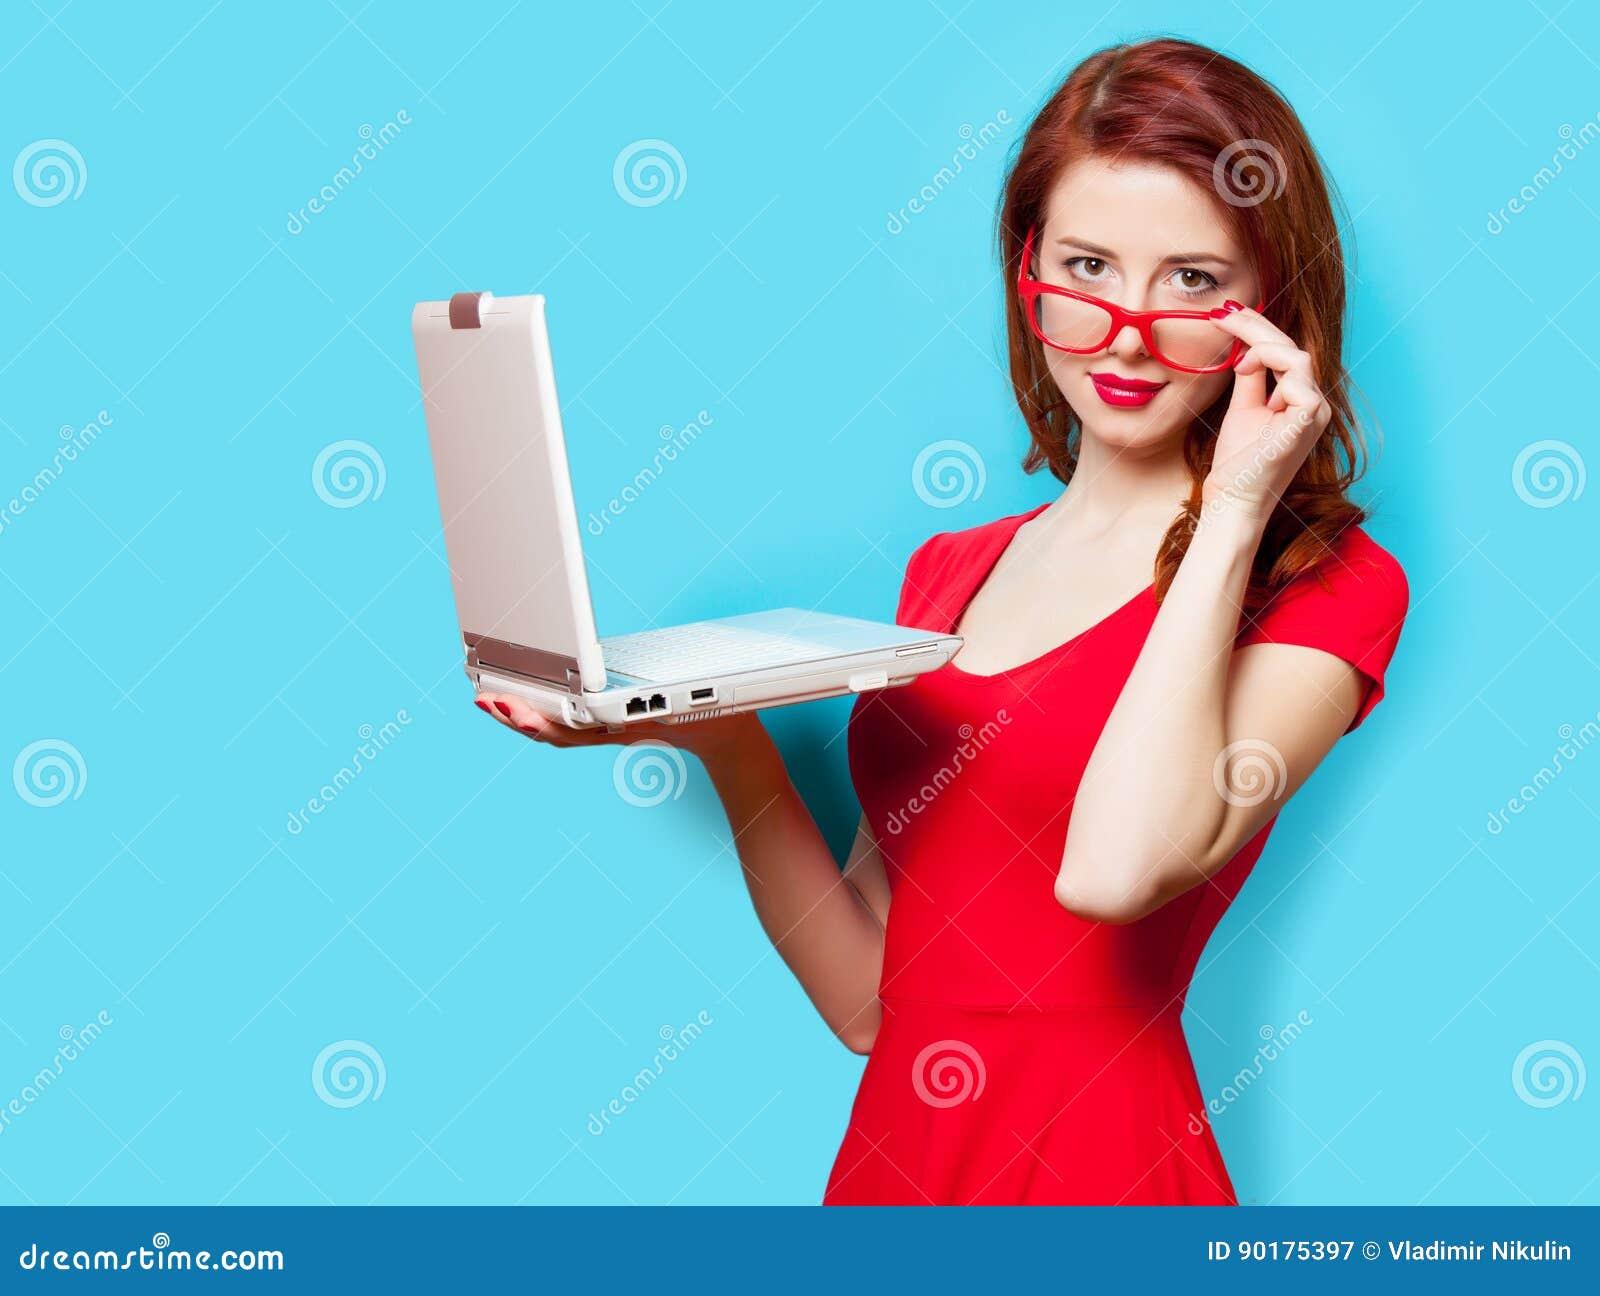 Photo of beautiful young woman holding laptop on the wonderful b